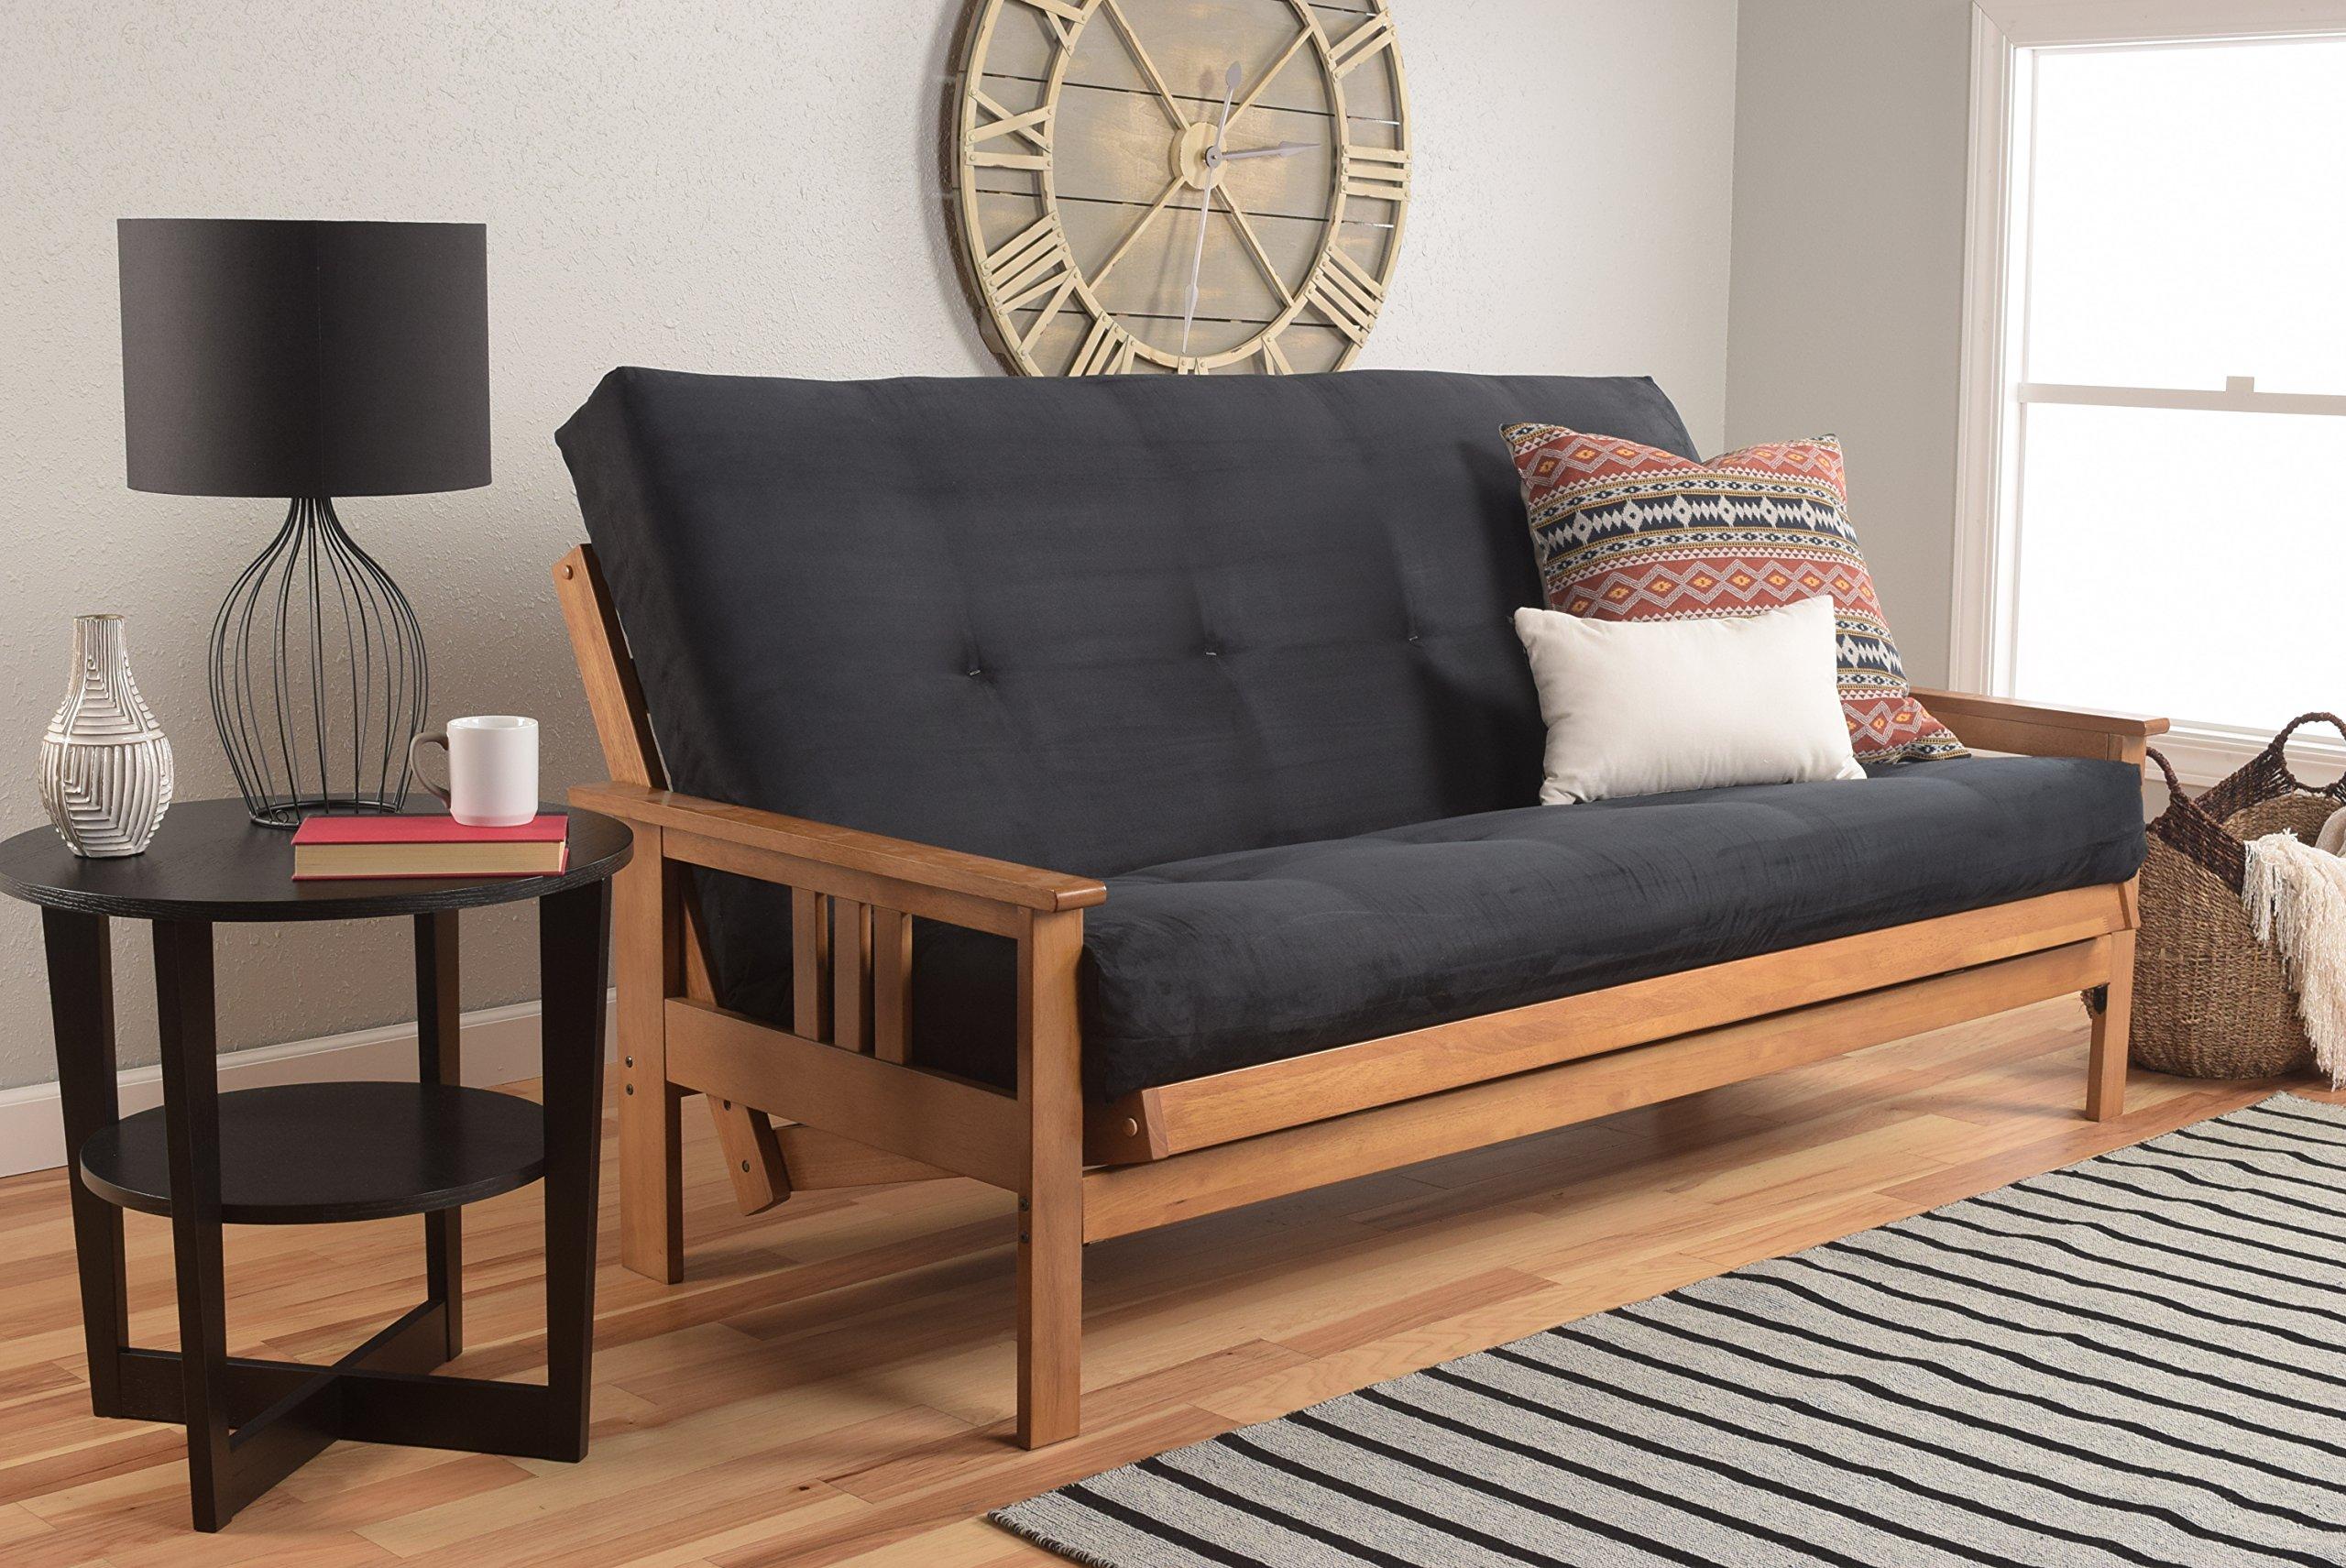 Kodiak Furniture Monterey Futon Set with Butternut Finish, Full, Suede Black by Kodiak Furniture